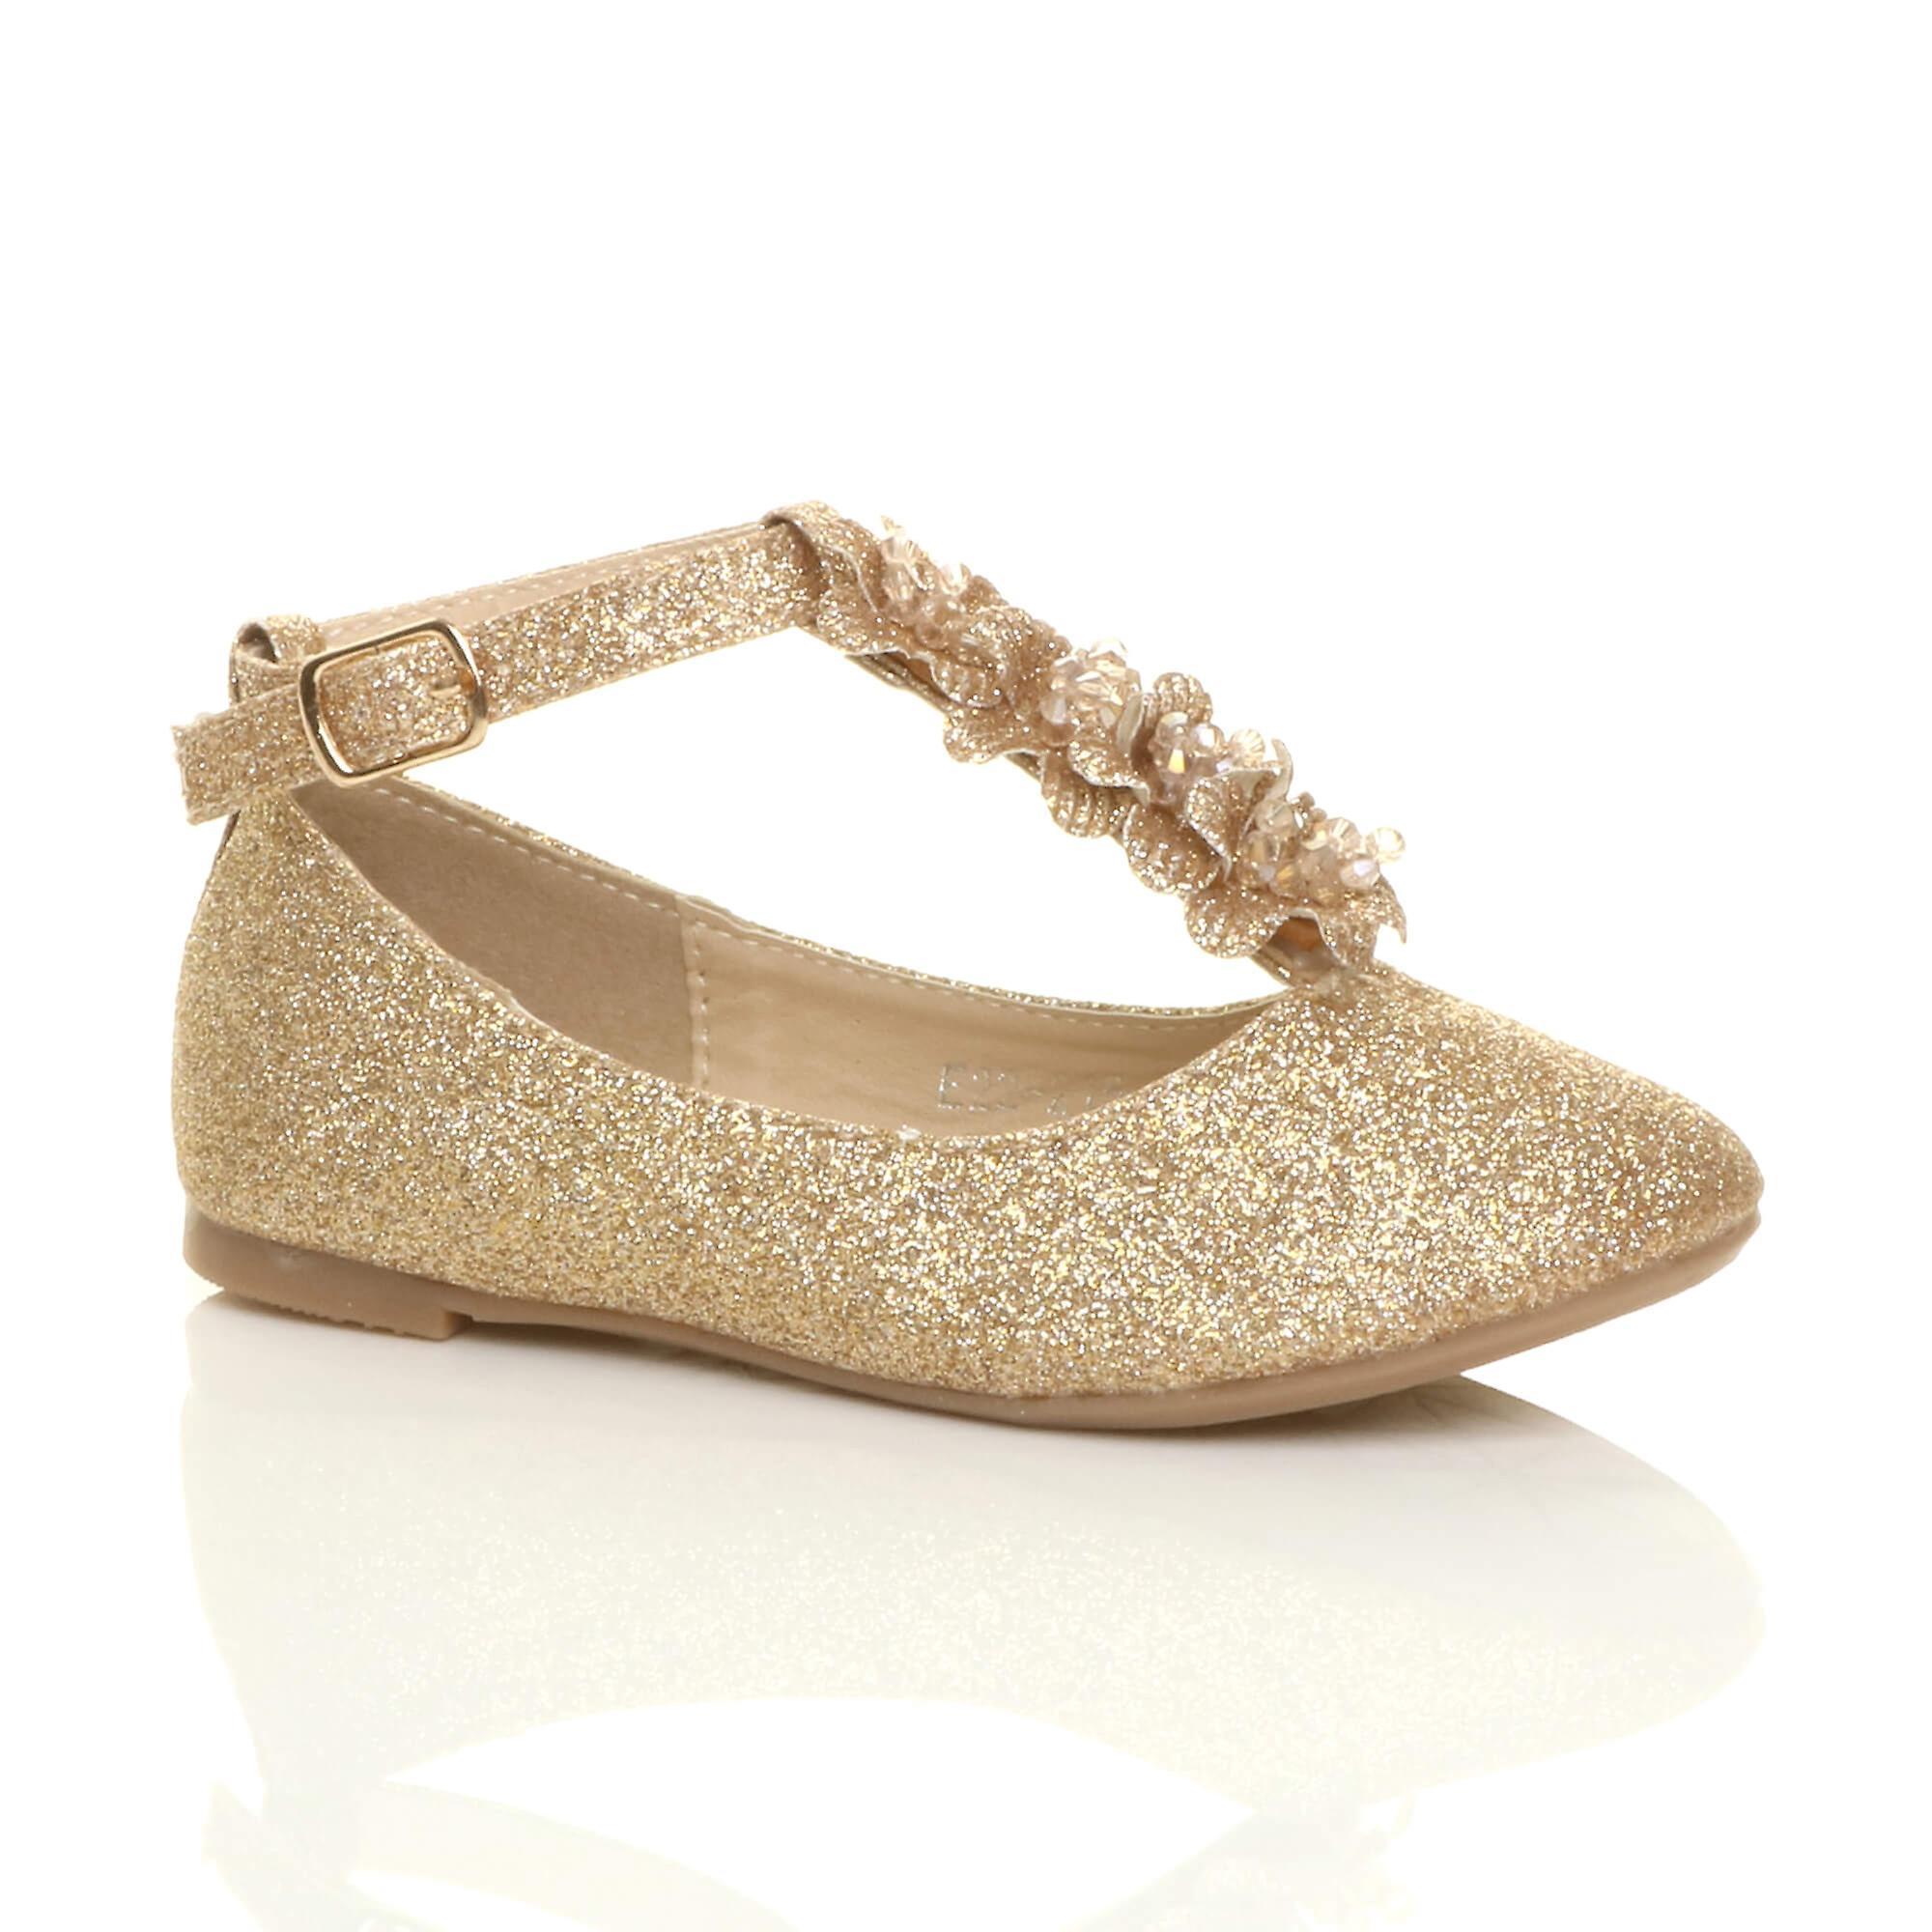 Ajvani girls flat t-bar glitter wedding bridesmaid shoes dressing up costume princess shoes bridesmaid ballerinas- Outstanding features -Gentlemen/Ladies 9609e0